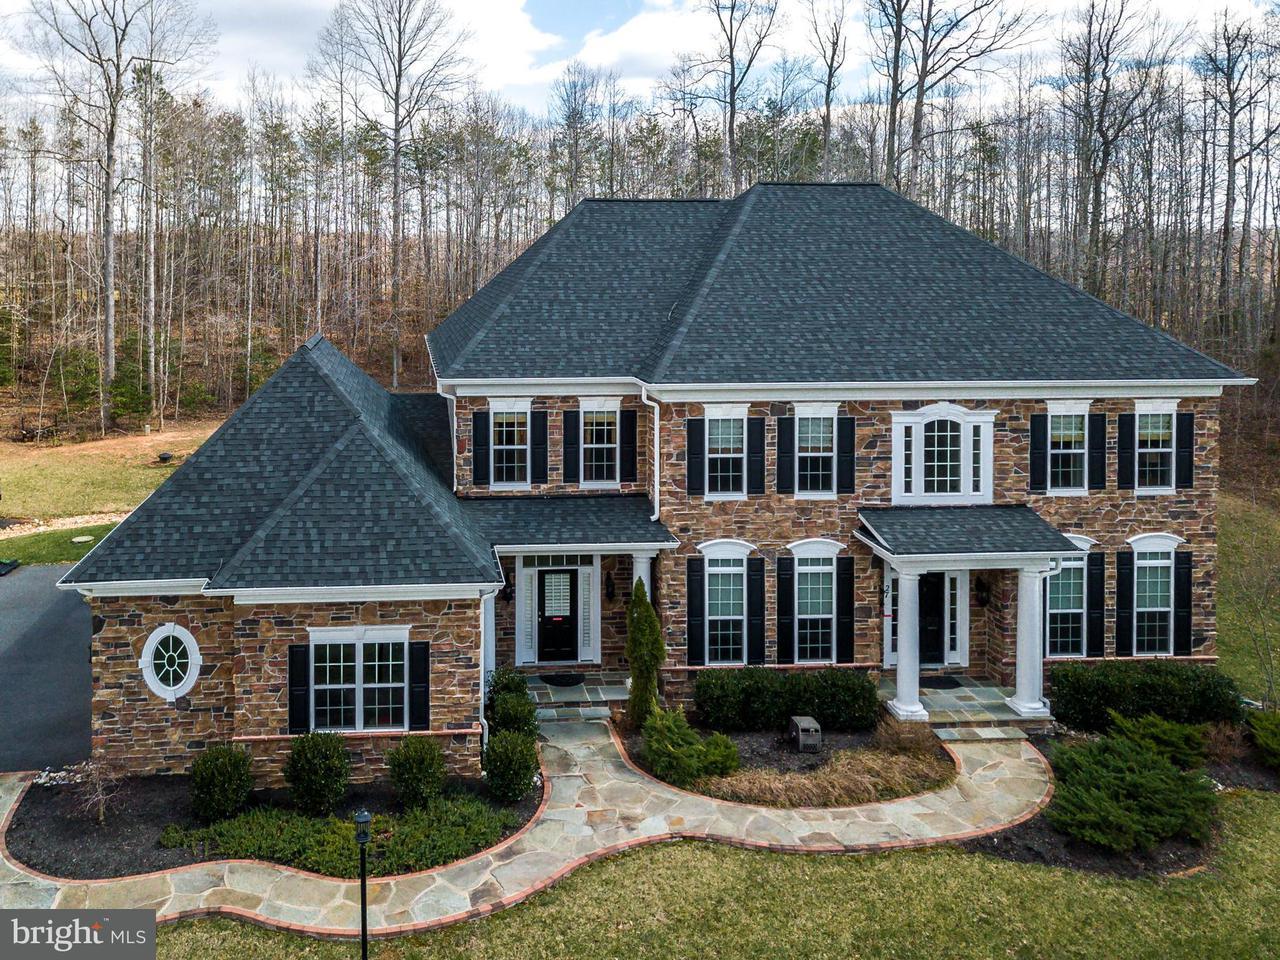 獨棟家庭住宅 為 出售 在 27 Snapdragon Drive 27 Snapdragon Drive Stafford, 弗吉尼亞州 22556 美國